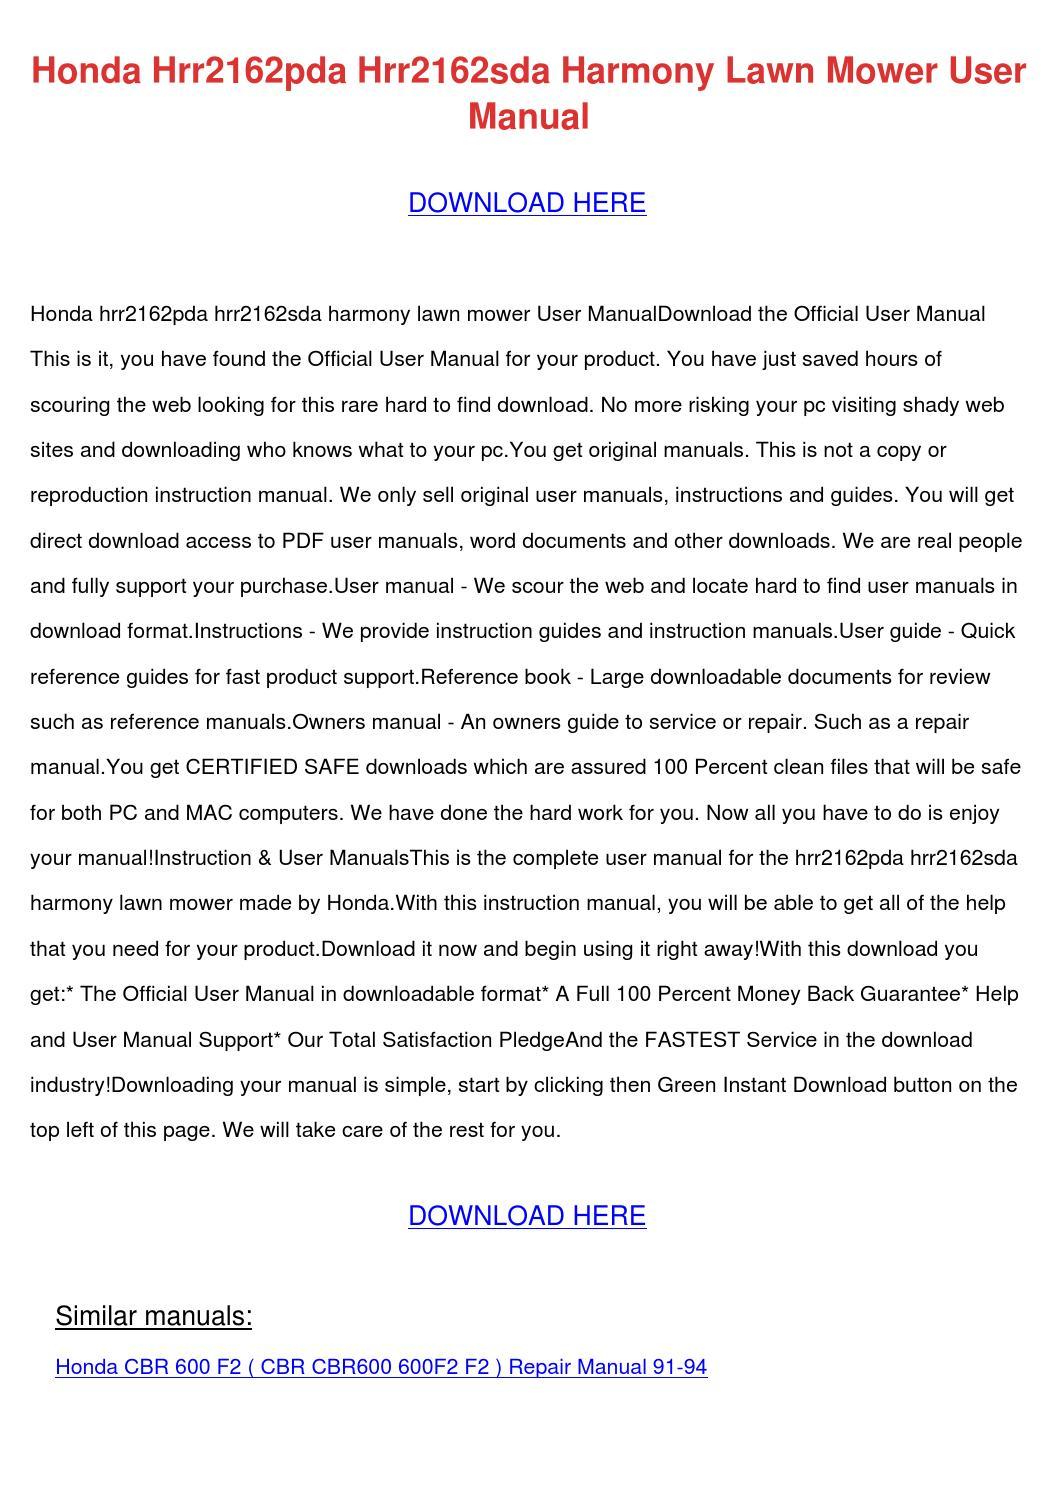 Honda Hrr2162sda Service Manual